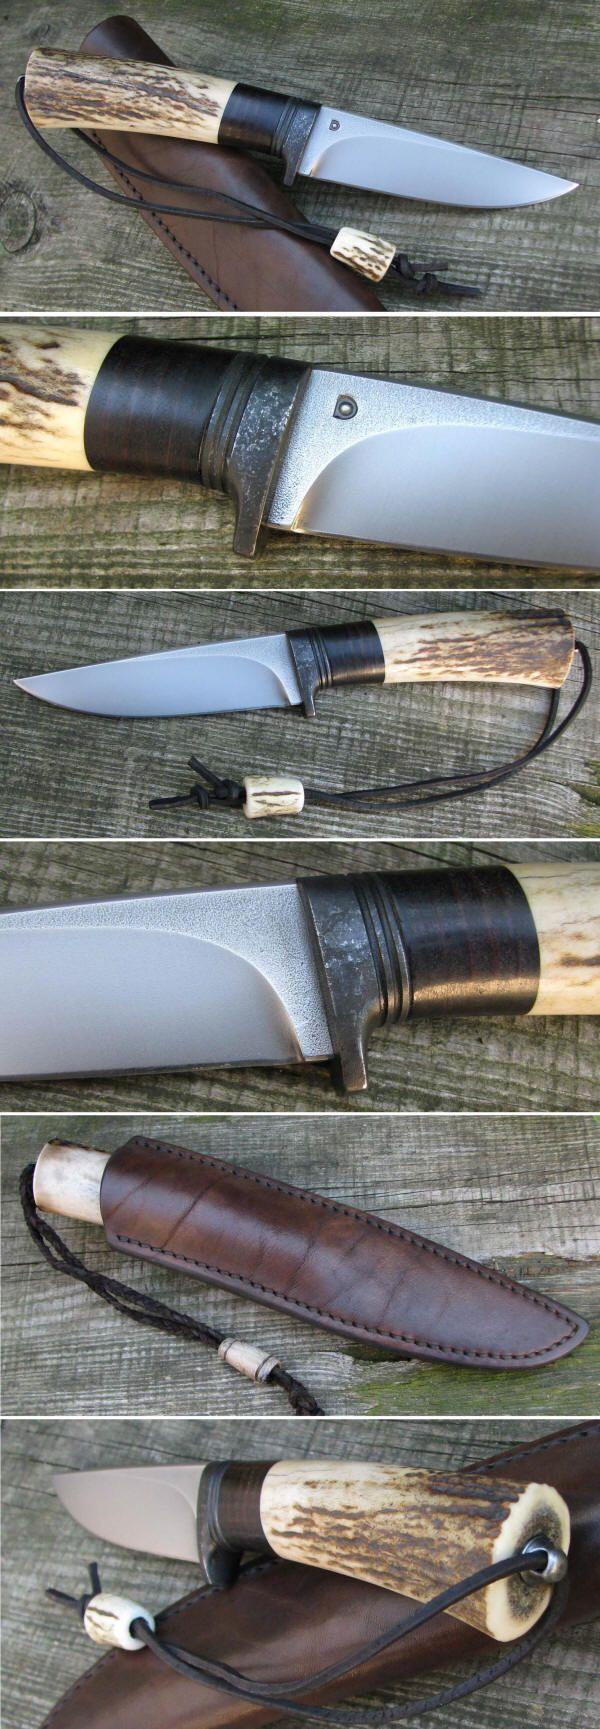 208 best steel images on pinterest kitchen knives chef knives